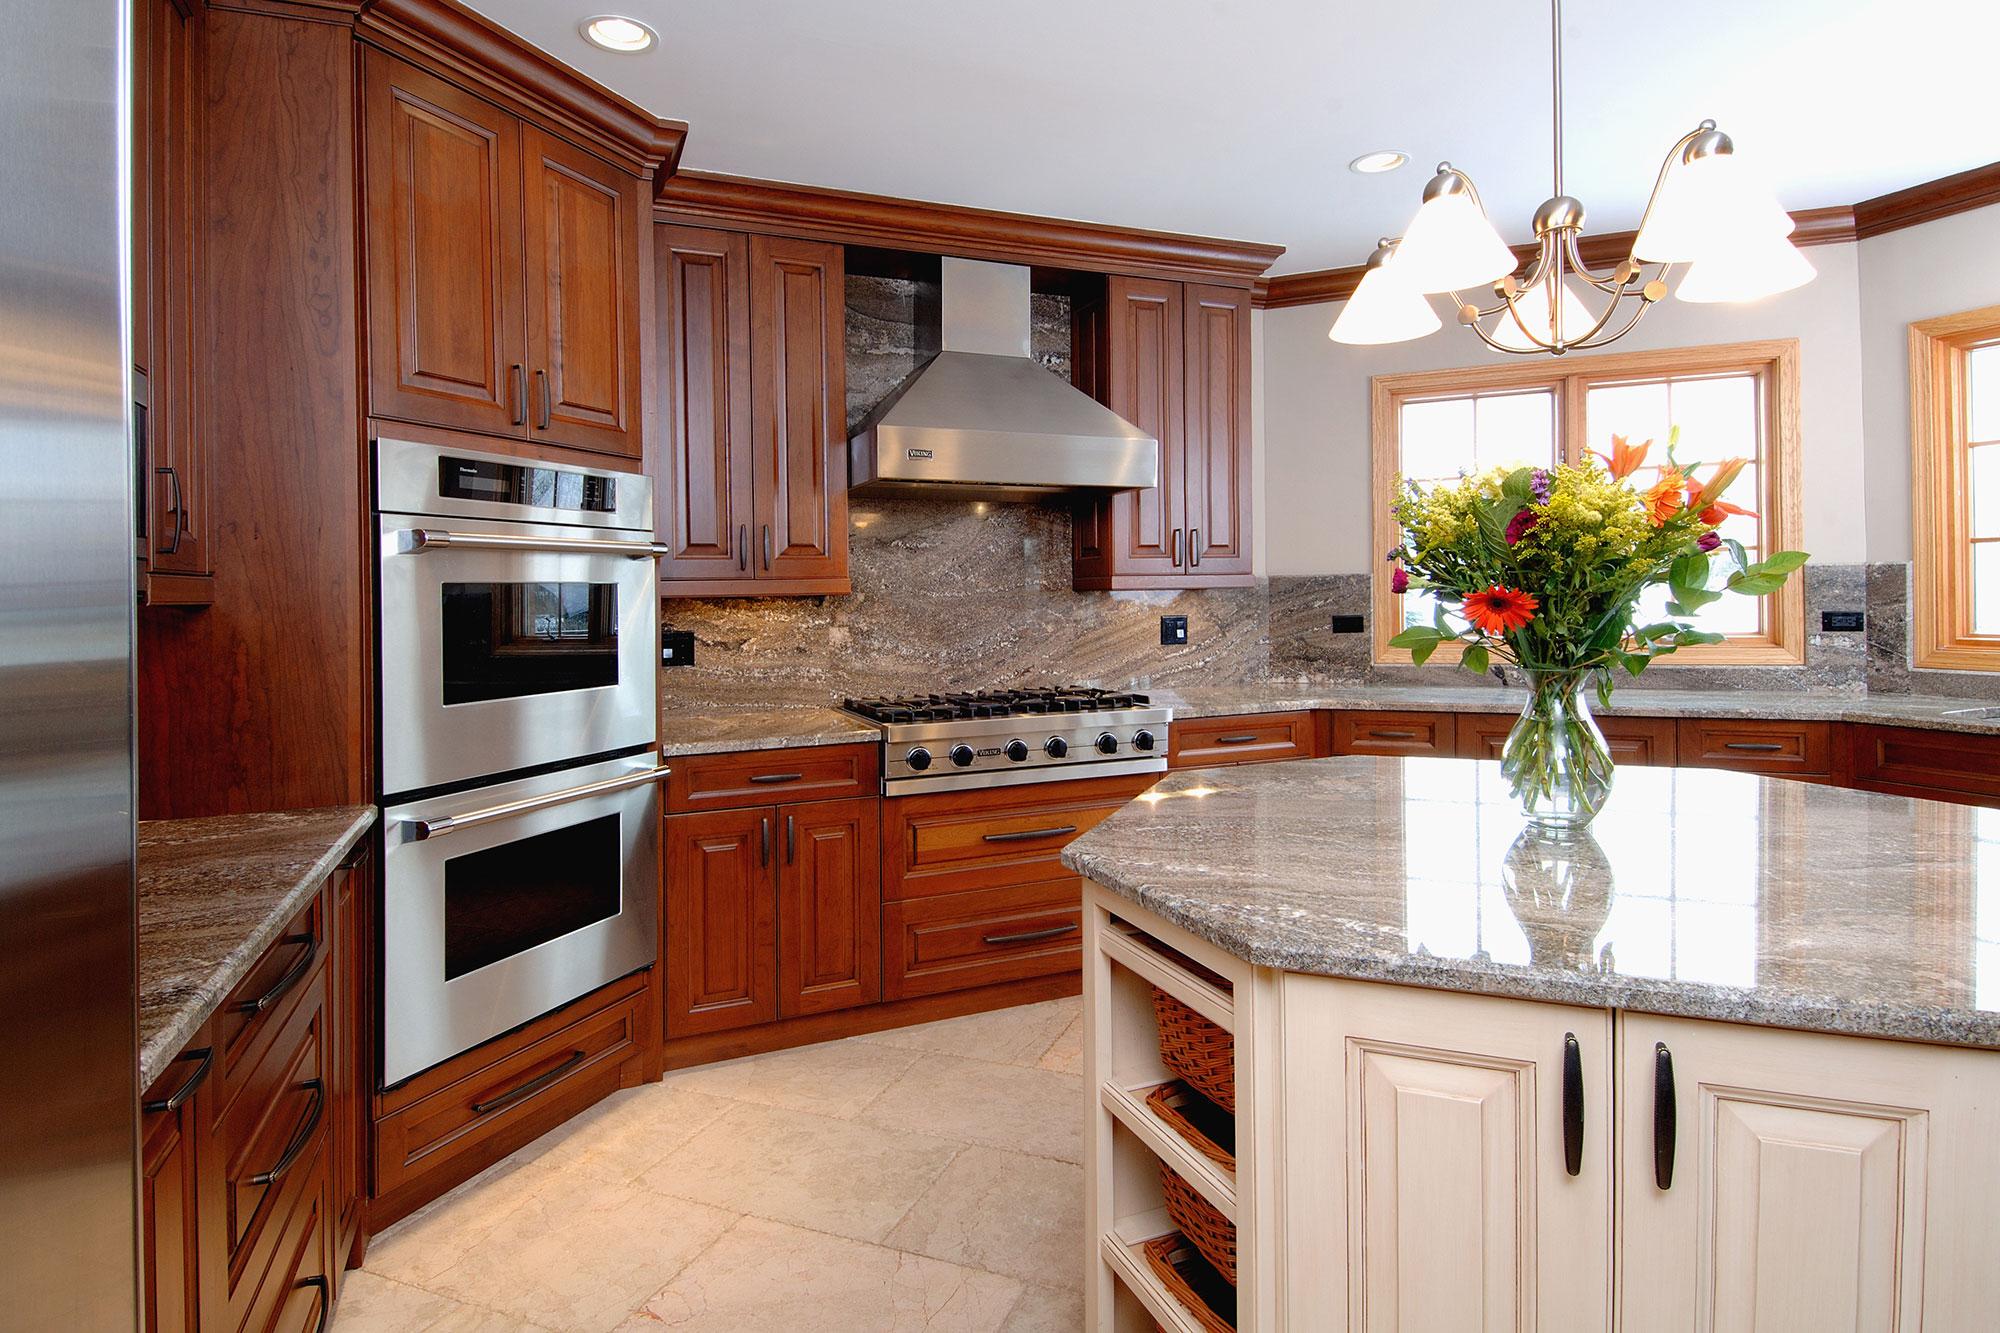 Cabinets – Kitchen & Bath | Kitchen Cabinets, Bath Cabinets